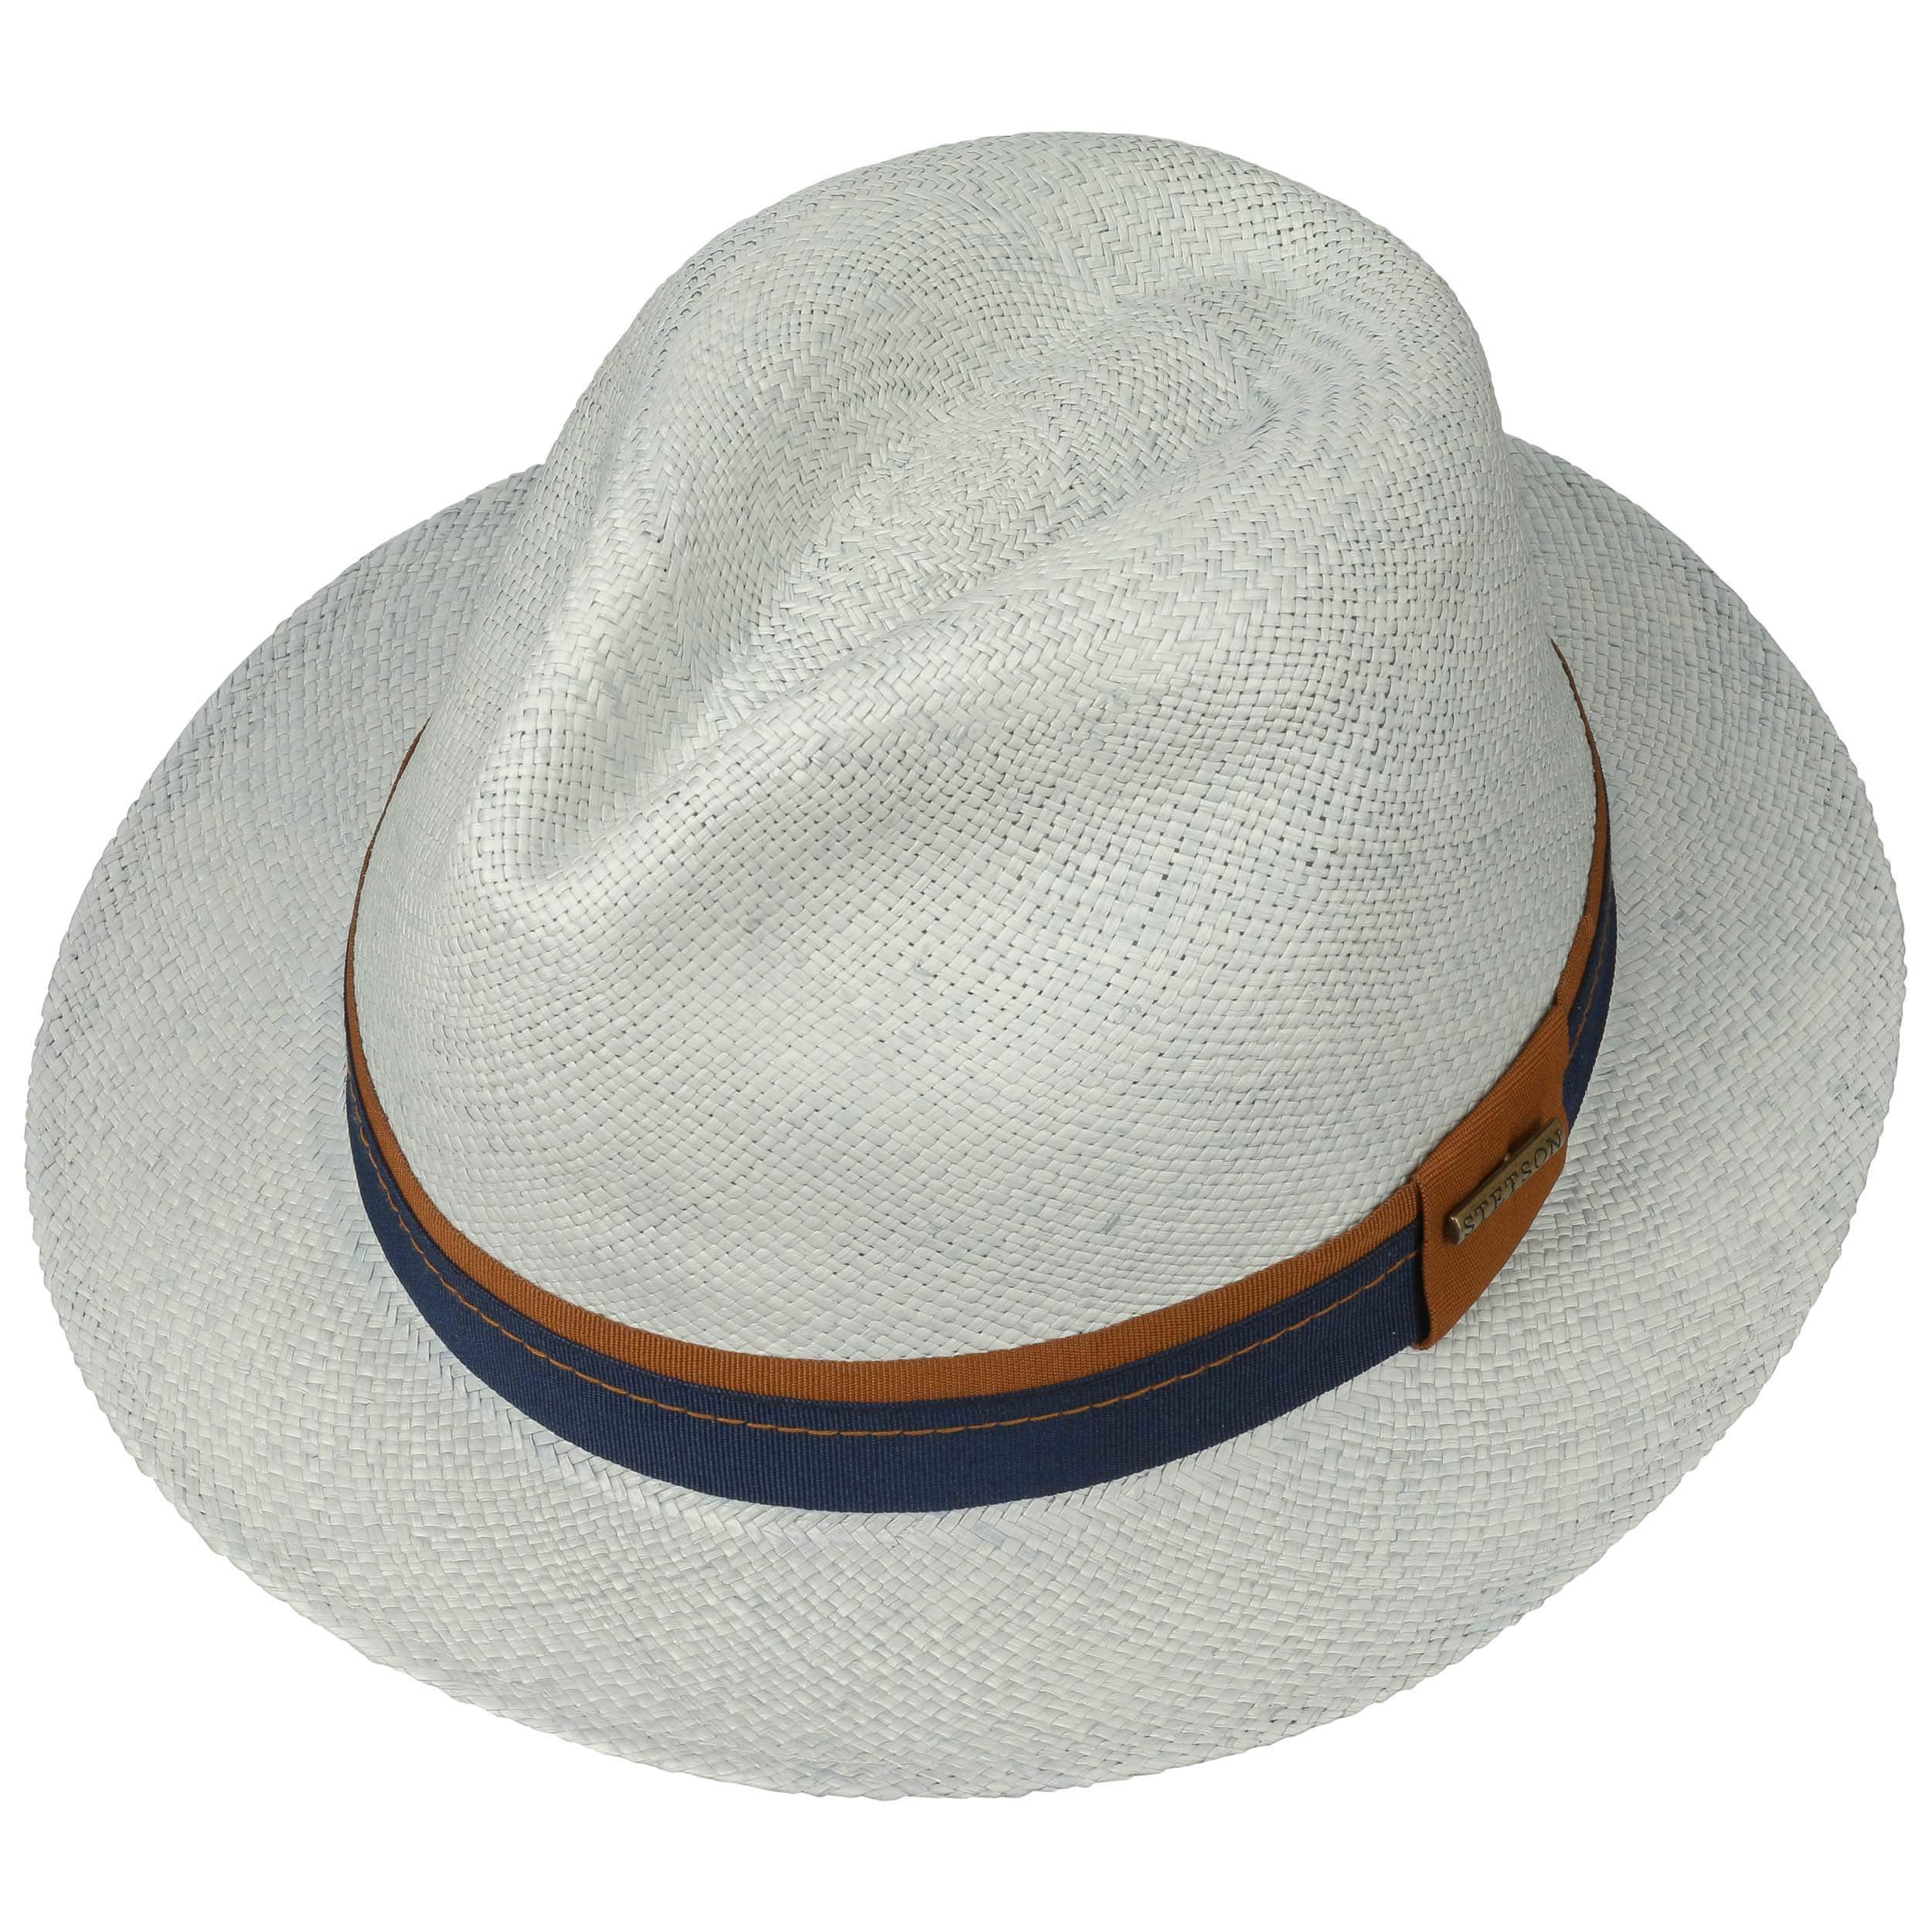 Fedora Panama Hat 1 by Stetson - light blue 1 ... fe02eea29190